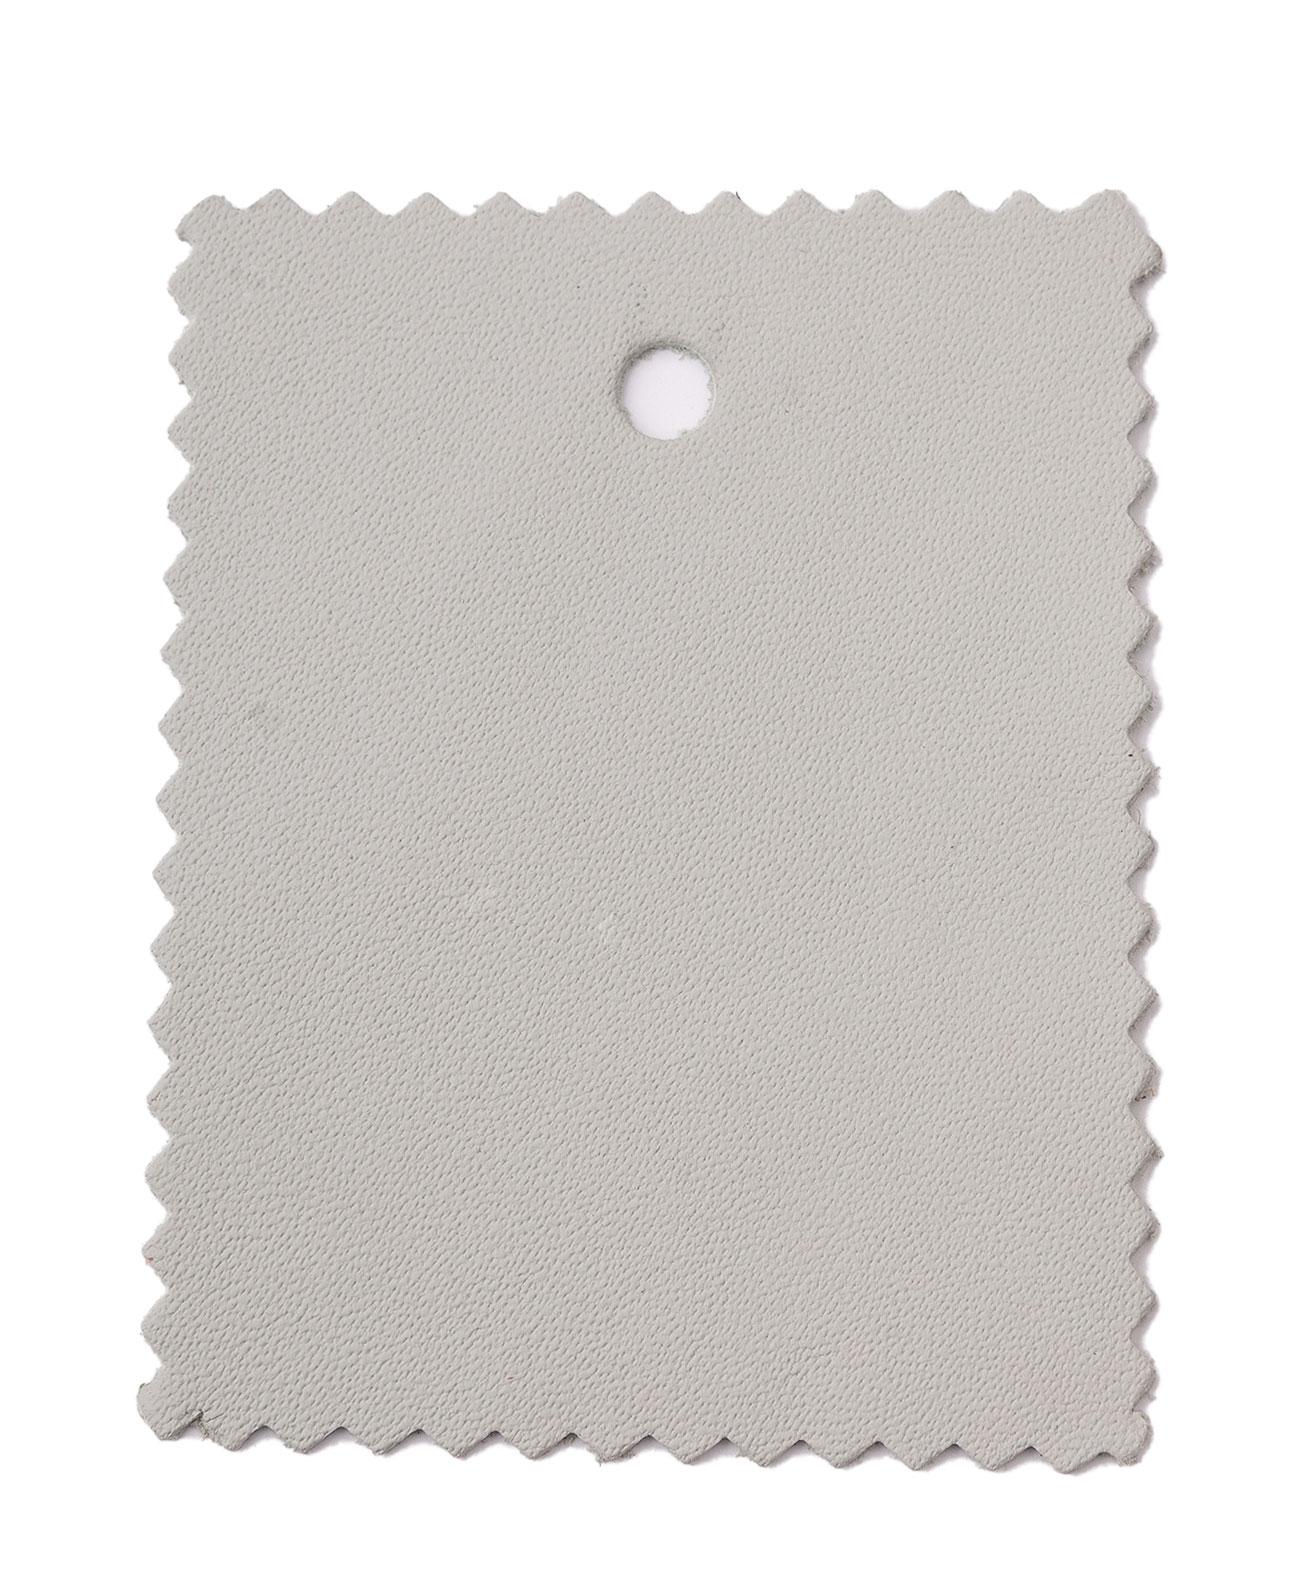 Abbildung porsche-nappa-kieselgrau